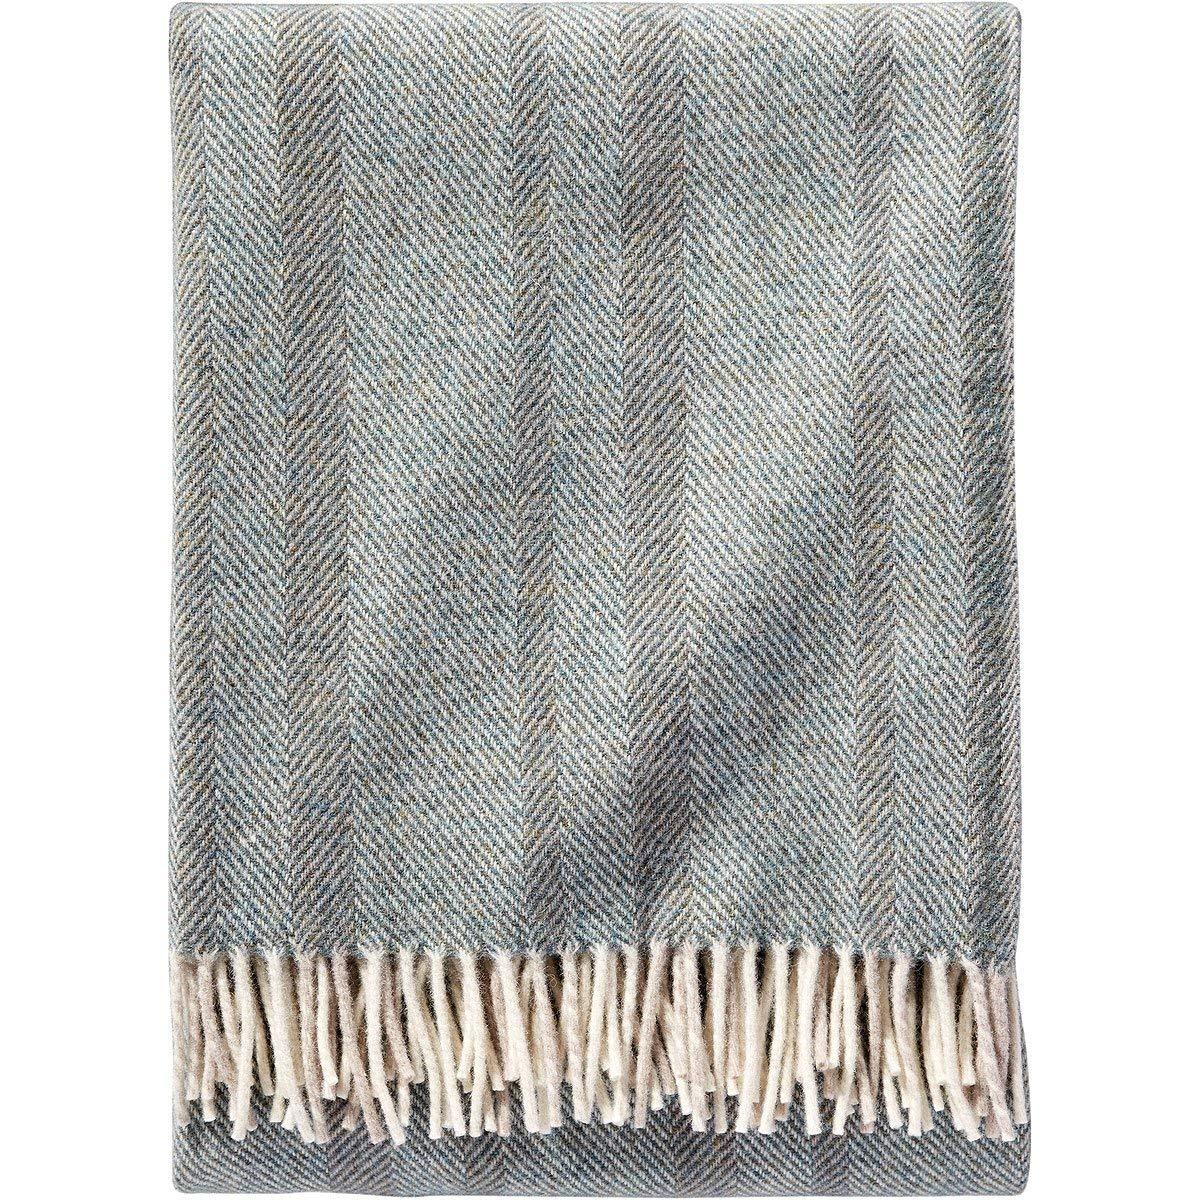 Pendleton Eco-Wise Herringbone Wool Throw Blanket a86749b0c